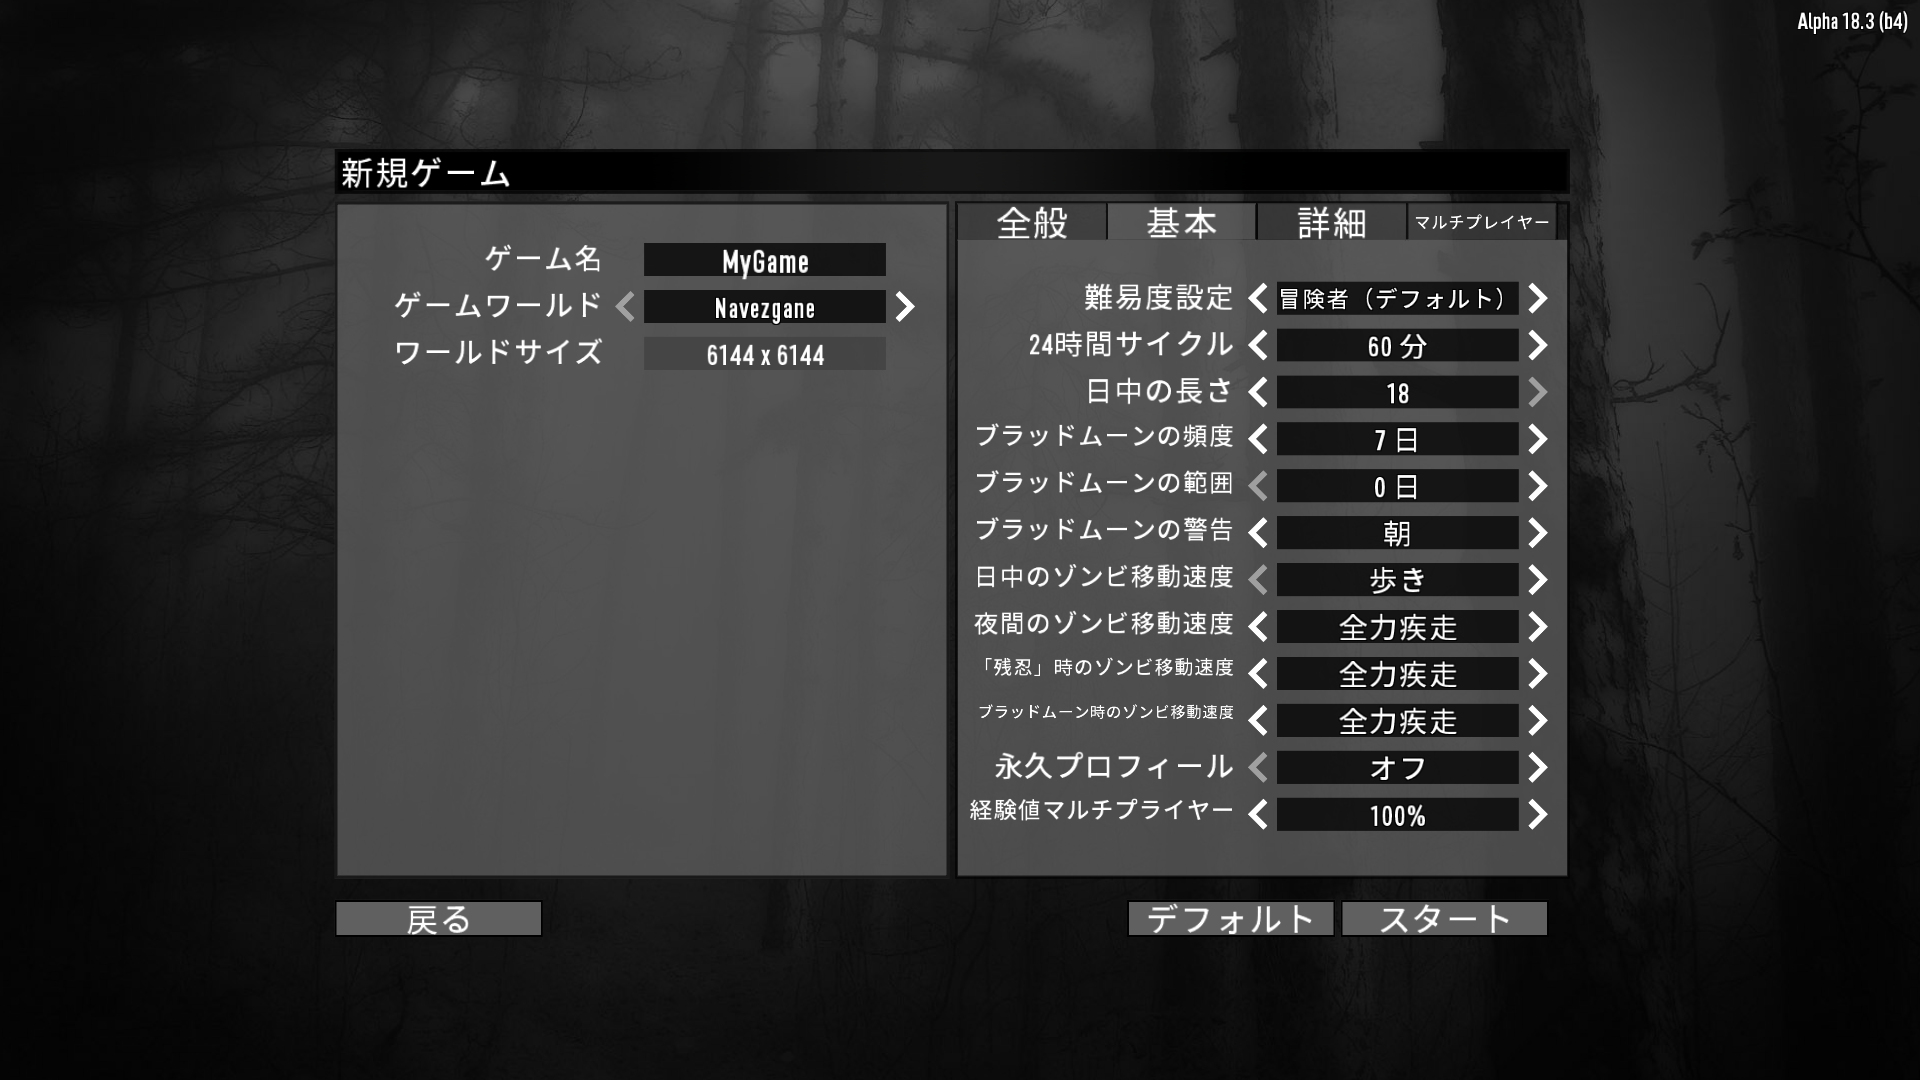 titleA18_Basic_jp.jpg